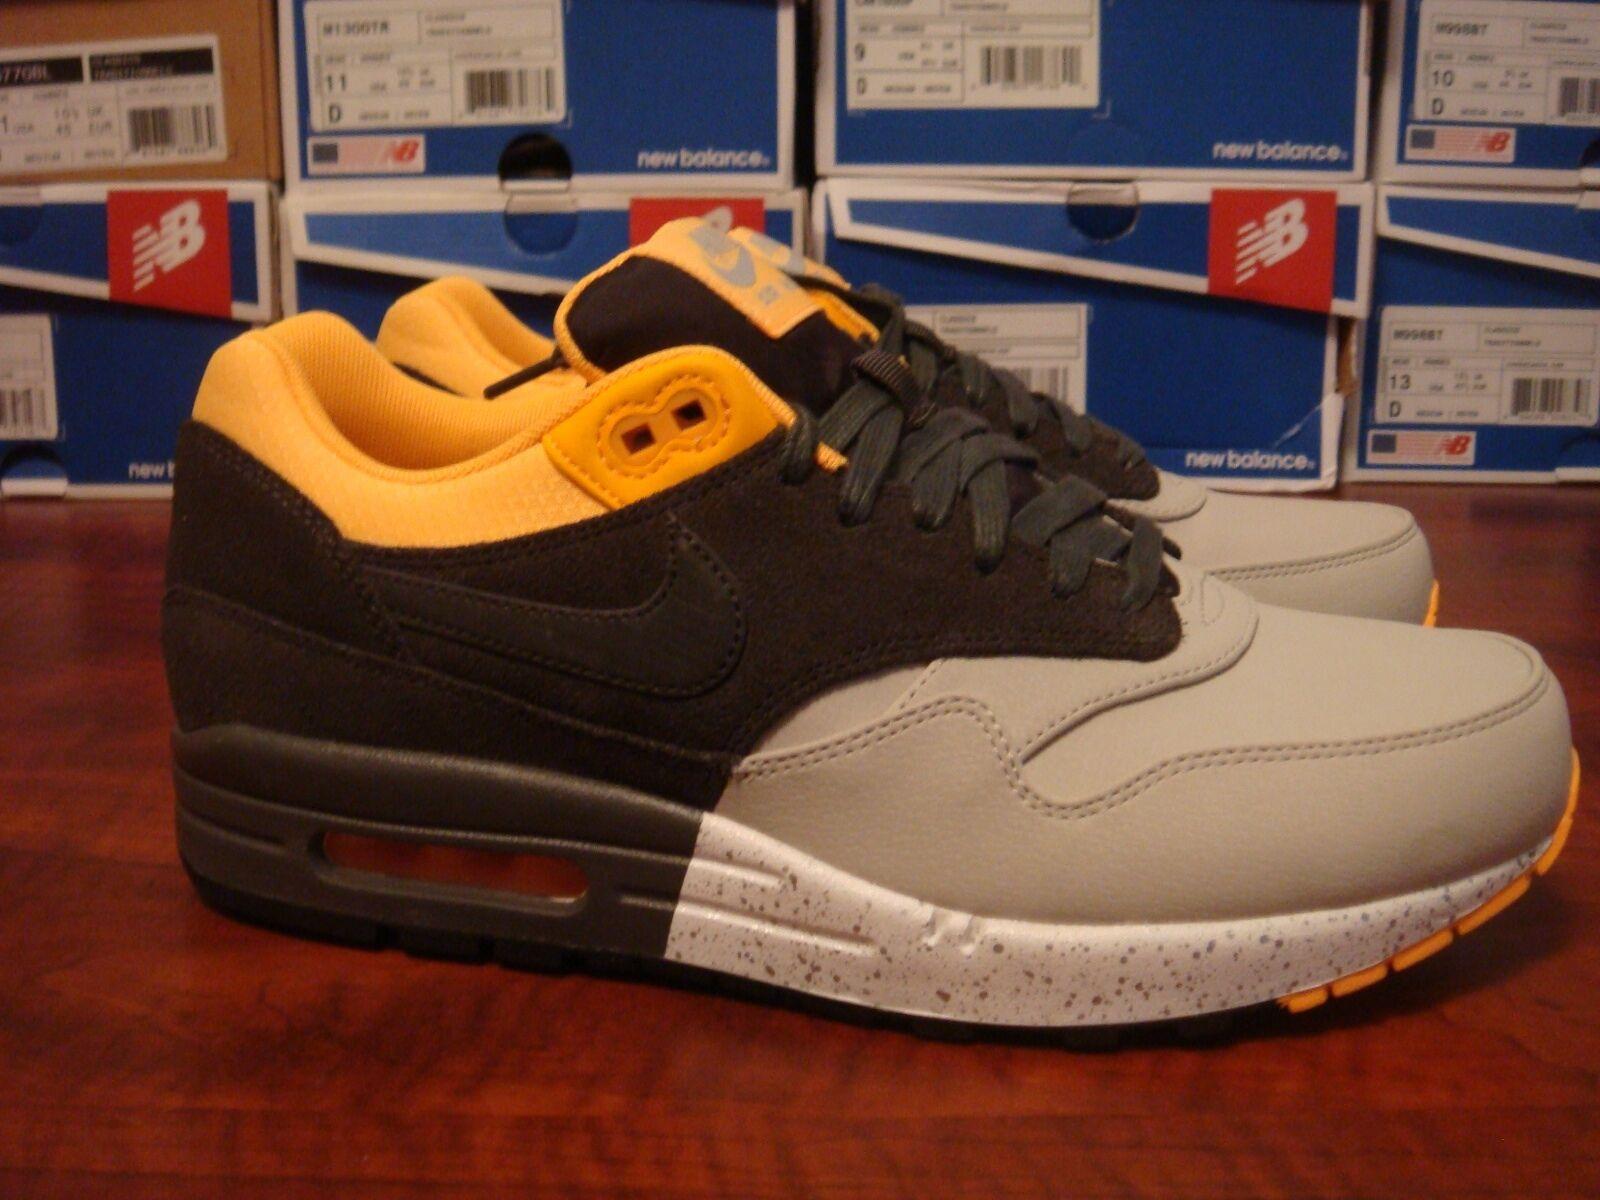 Nike Air Max PRM Yellow Grey size 8.5